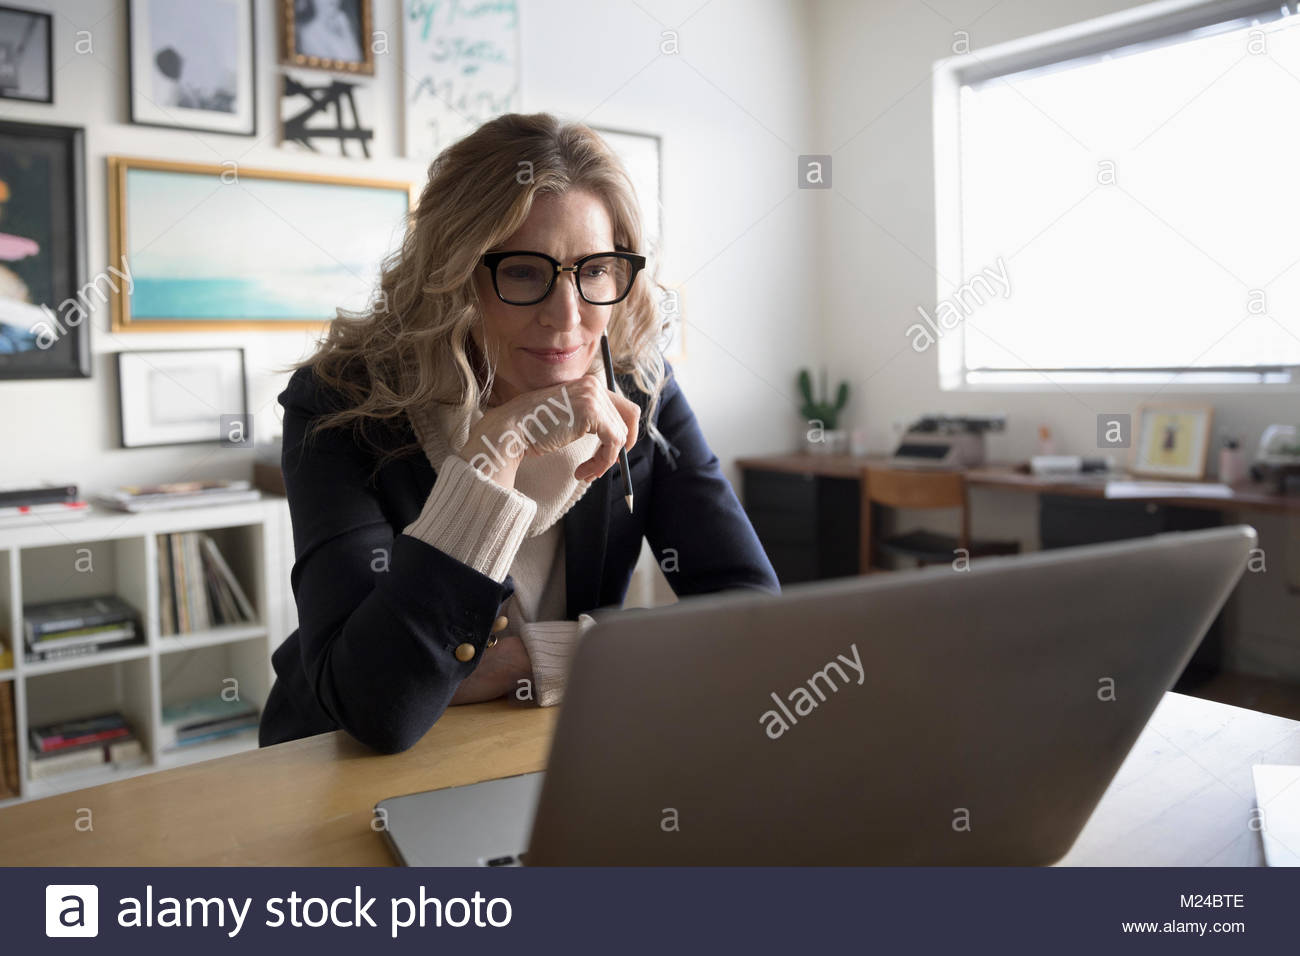 Entrepreneur Senior businesswoman working at laptop in office studio Photo Stock